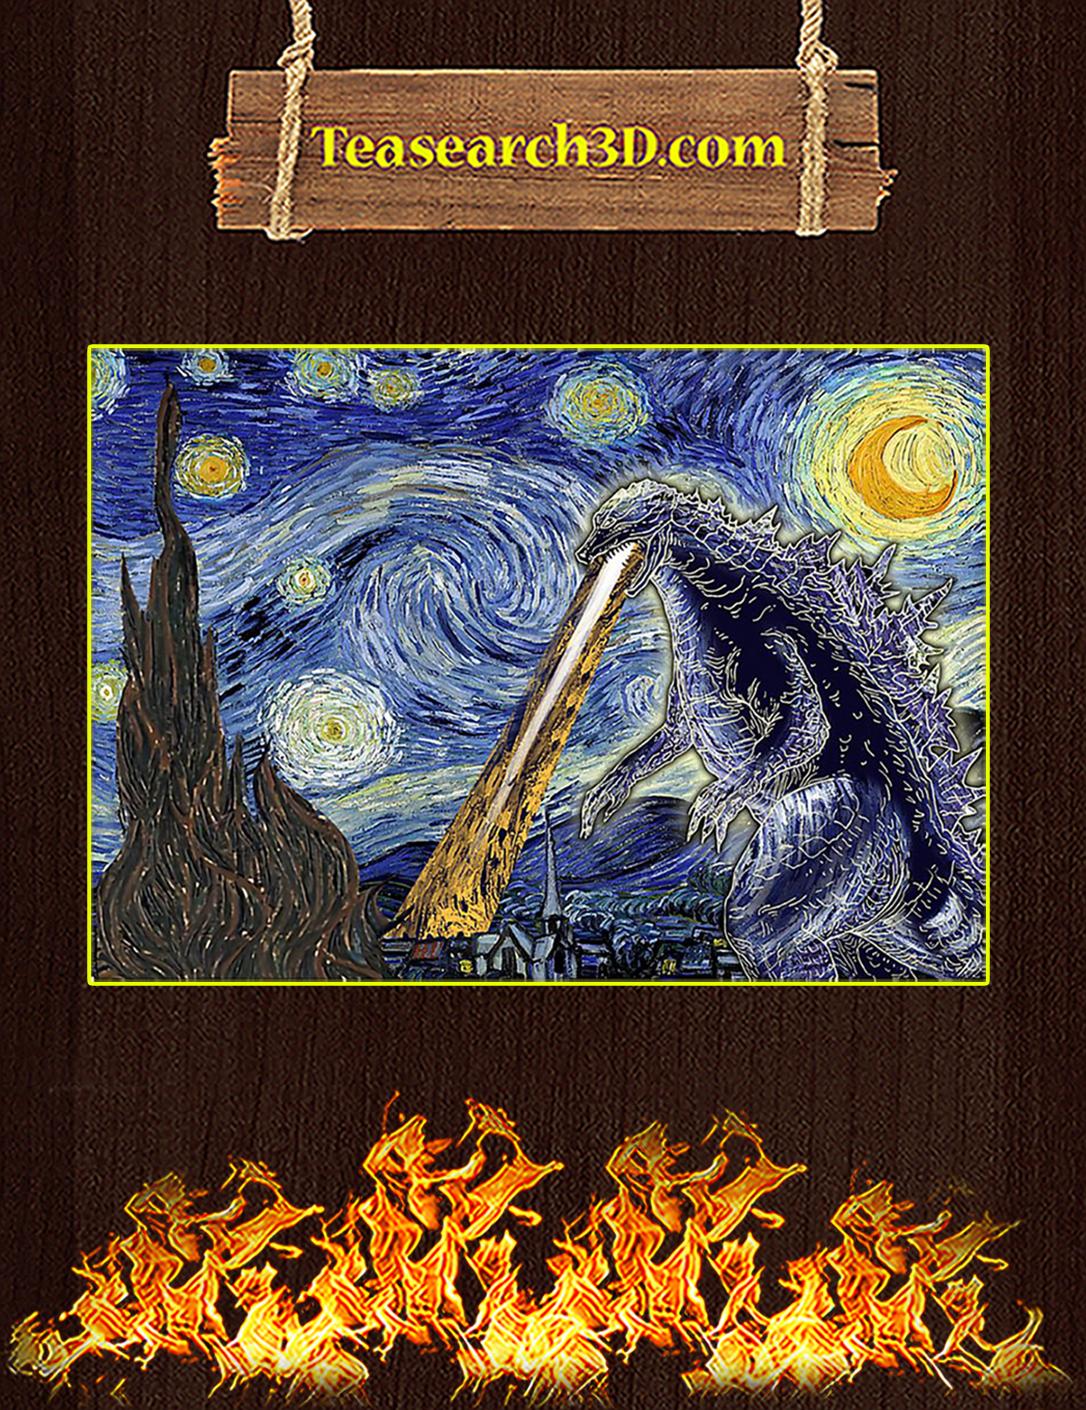 Van gogh starry night godzilla poster A2